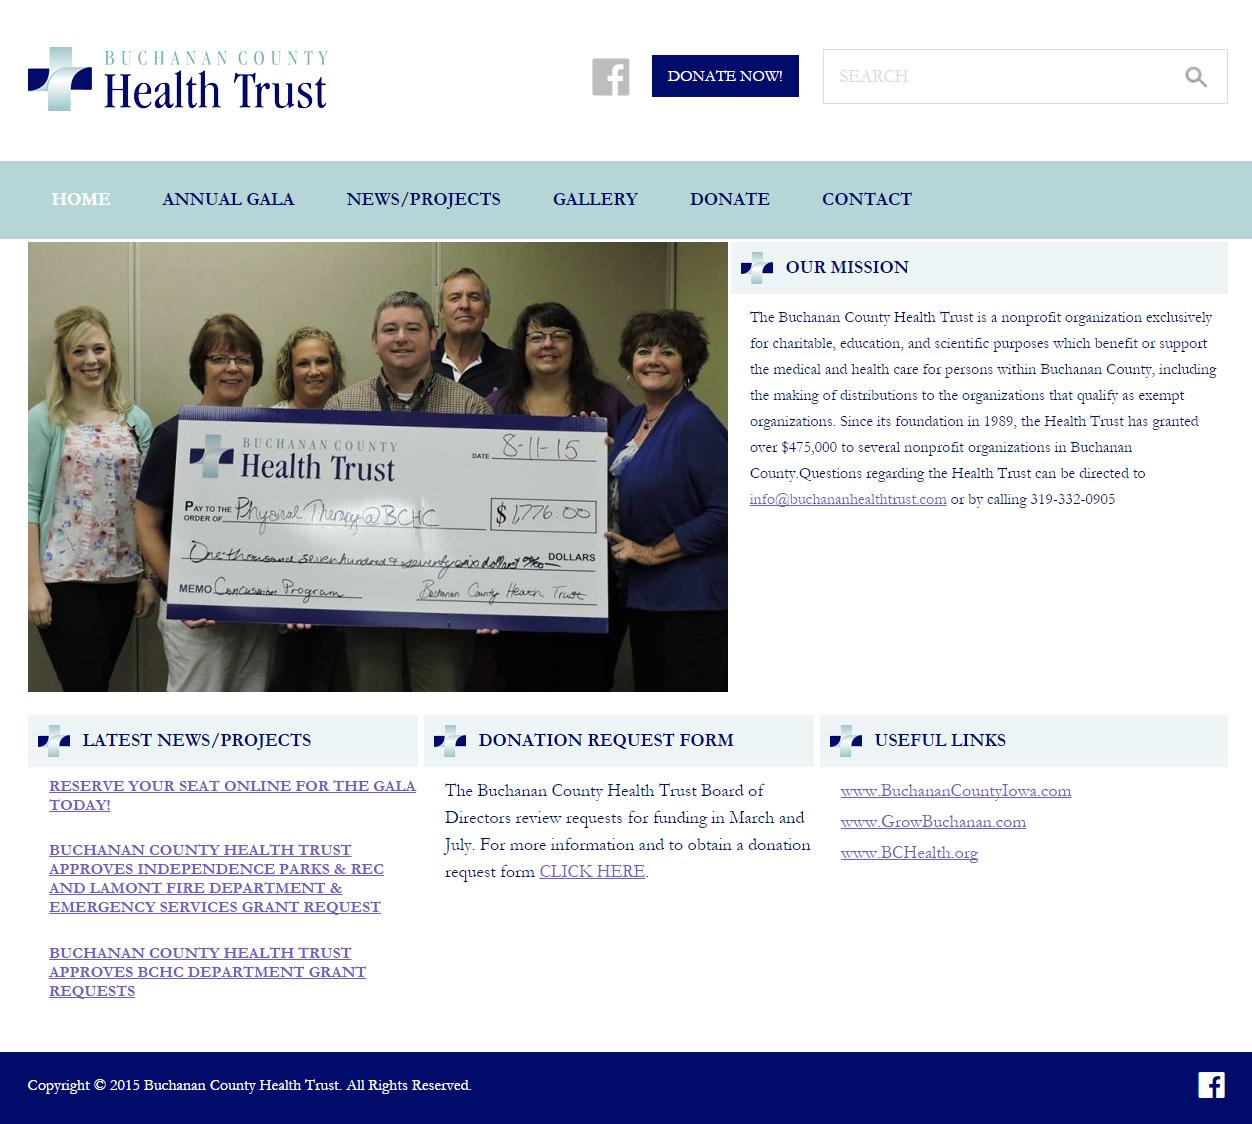 Buchanan County Health Trust